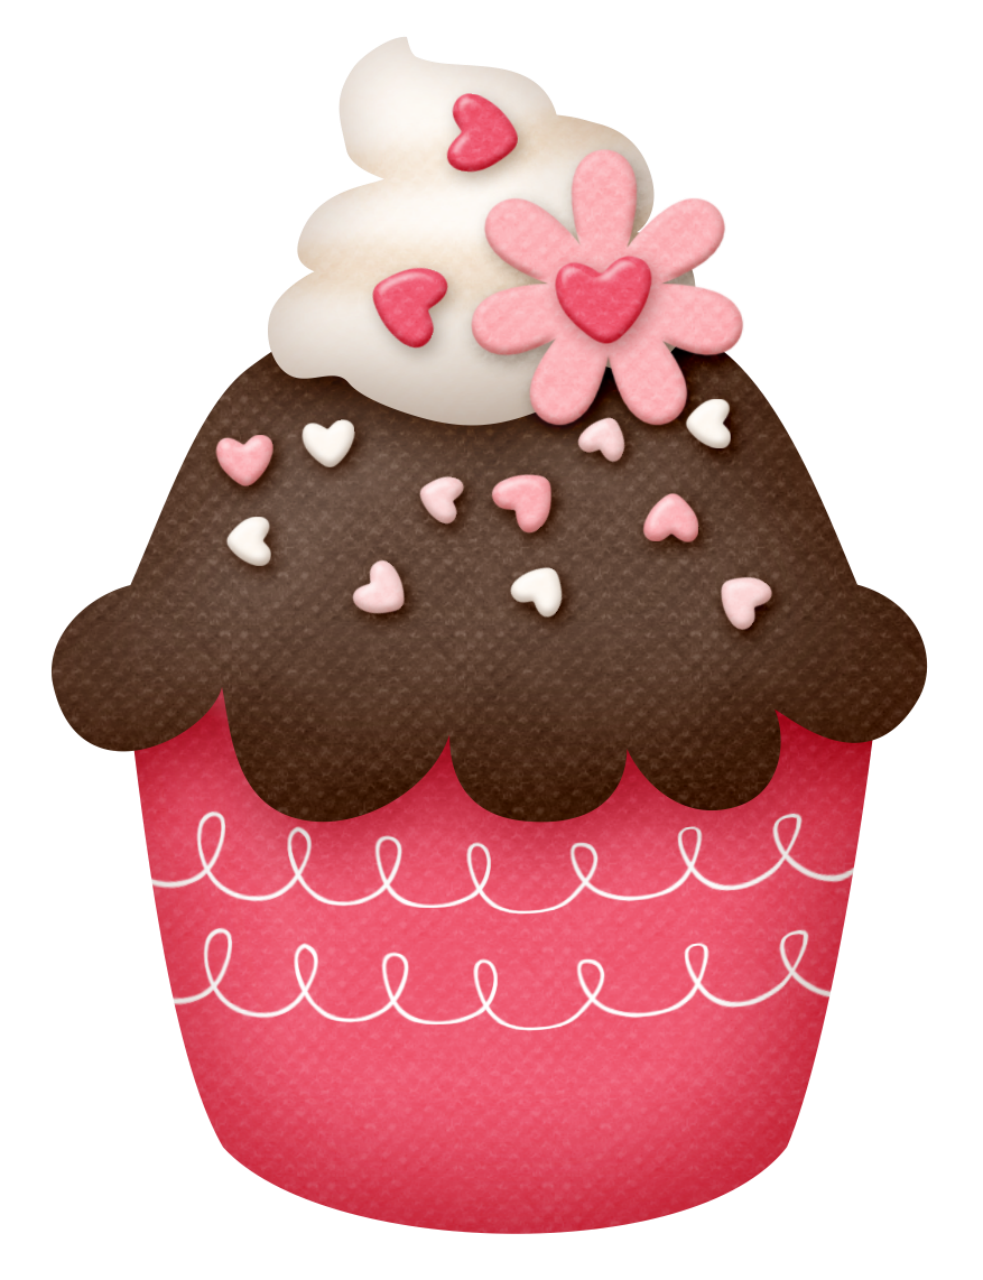 Clipart cupcake school. Https img fotki yandex